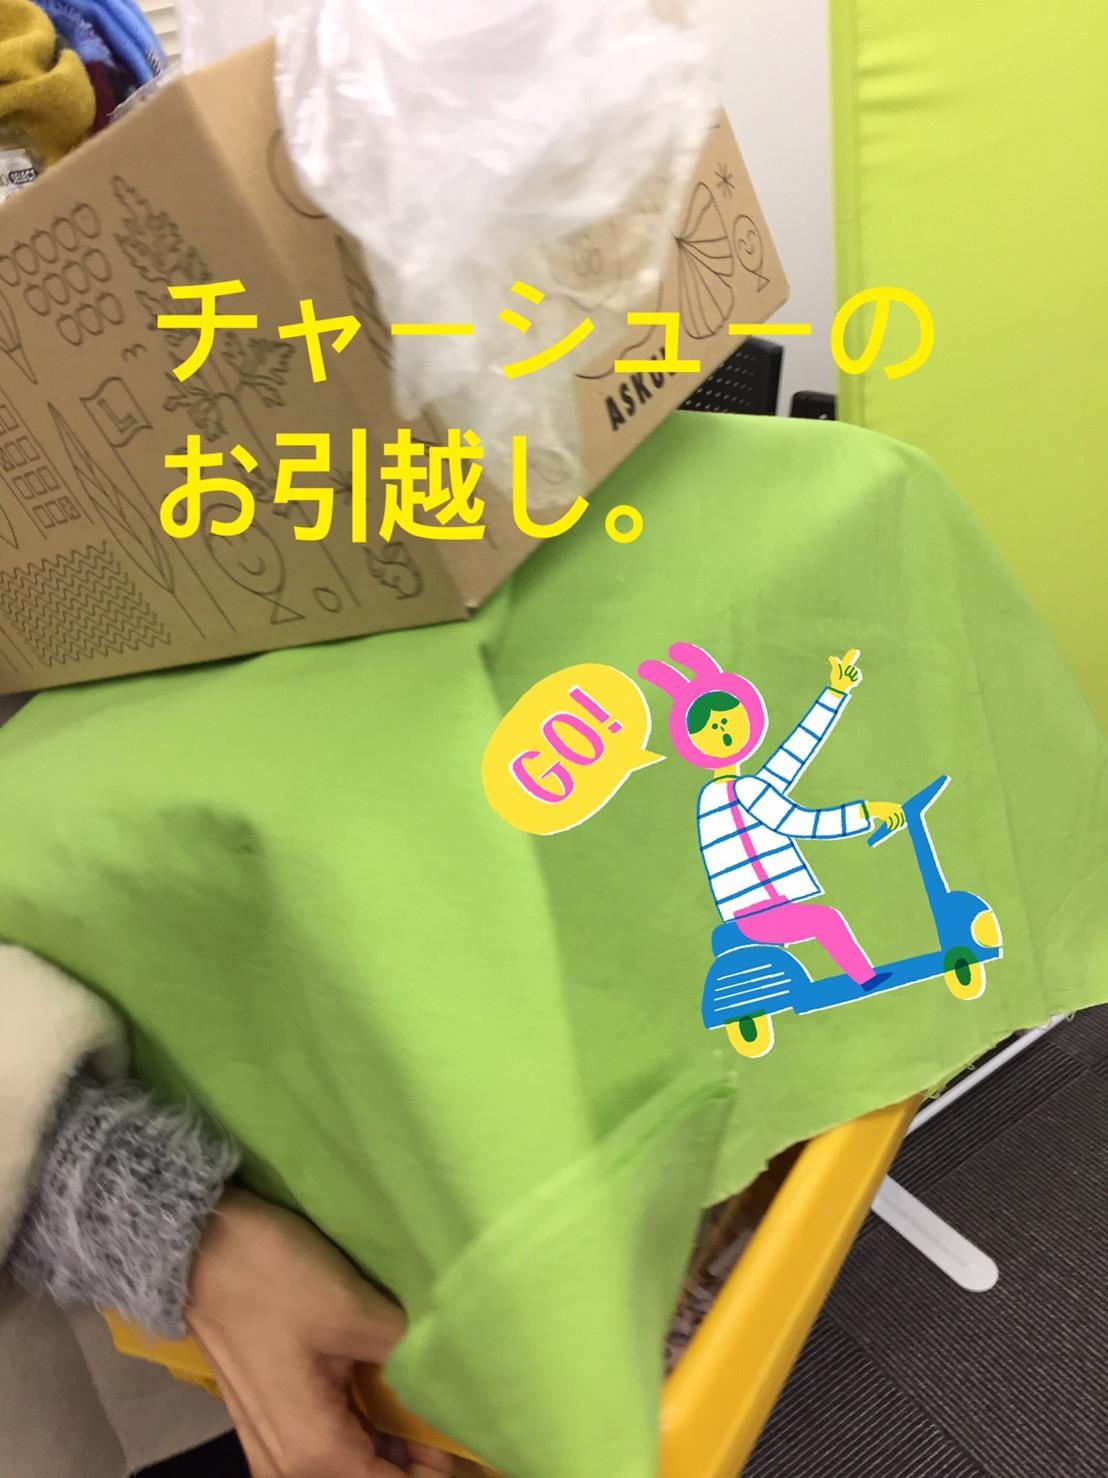 S__15581196.jpg